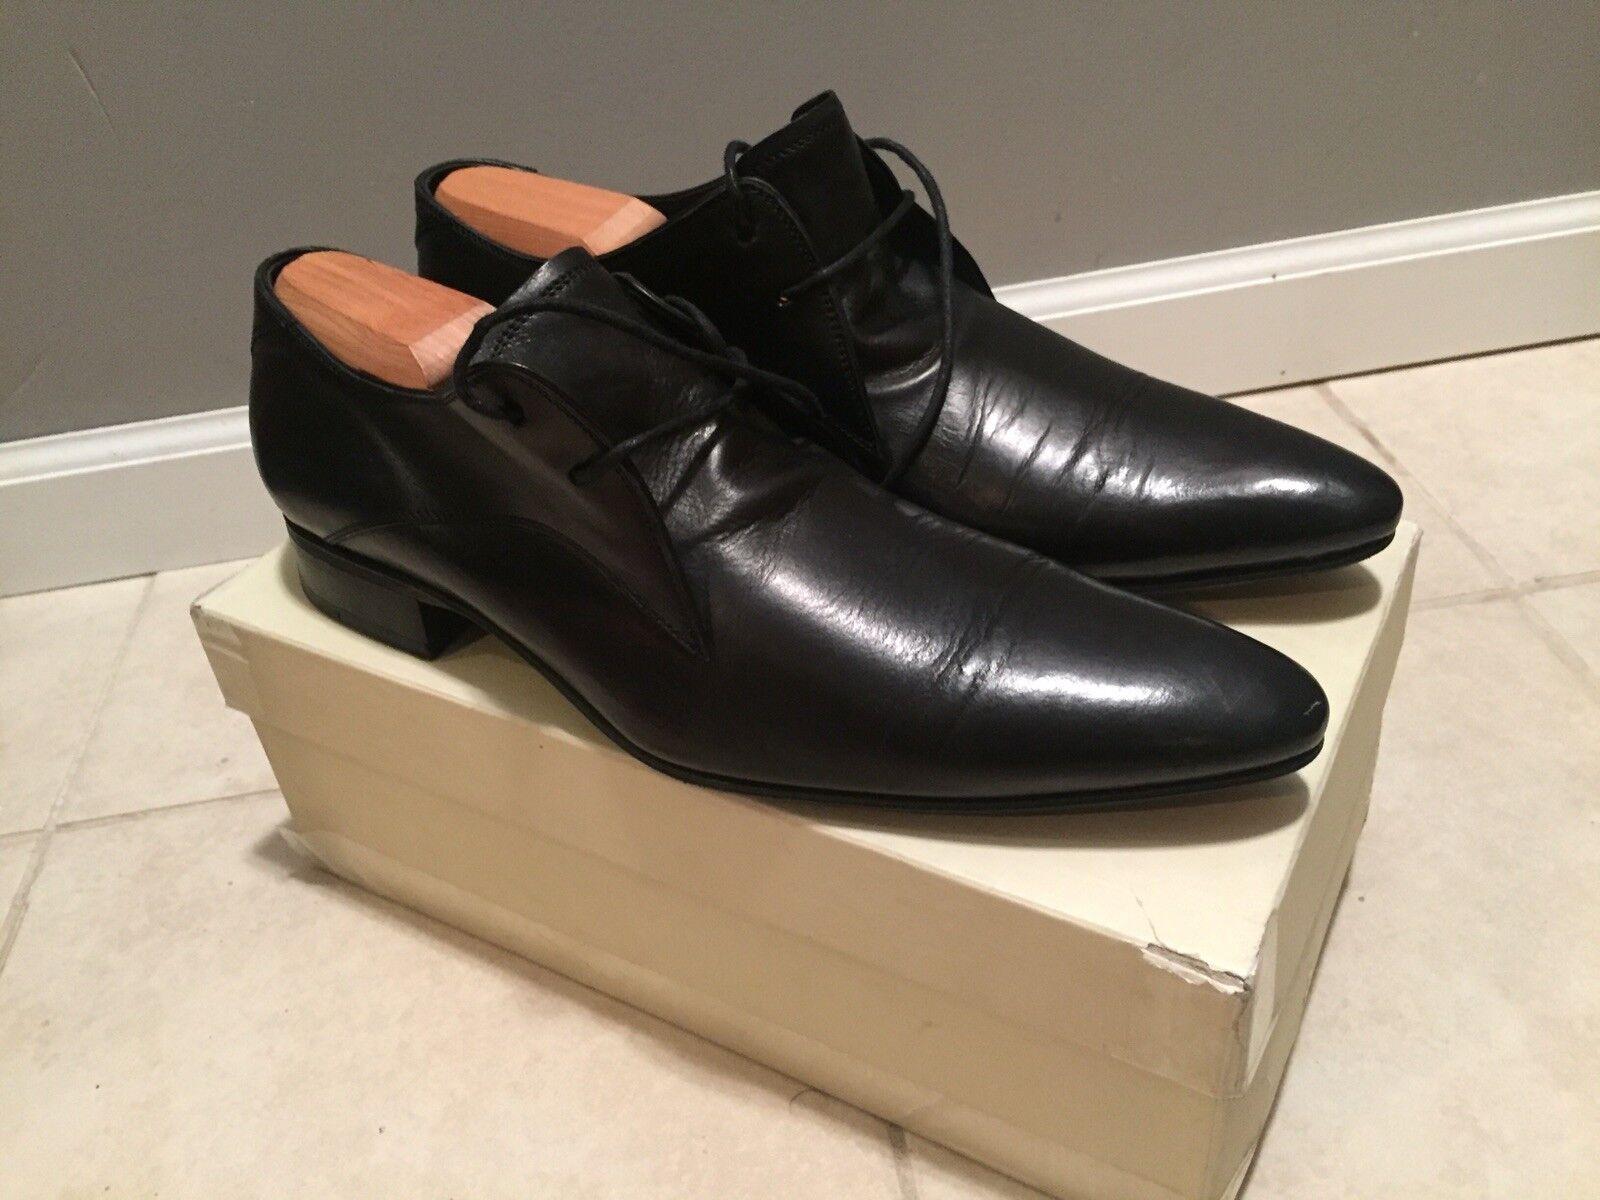 Zapatos de Cuero N.D.C. Made By Hand hetta Resina Negro